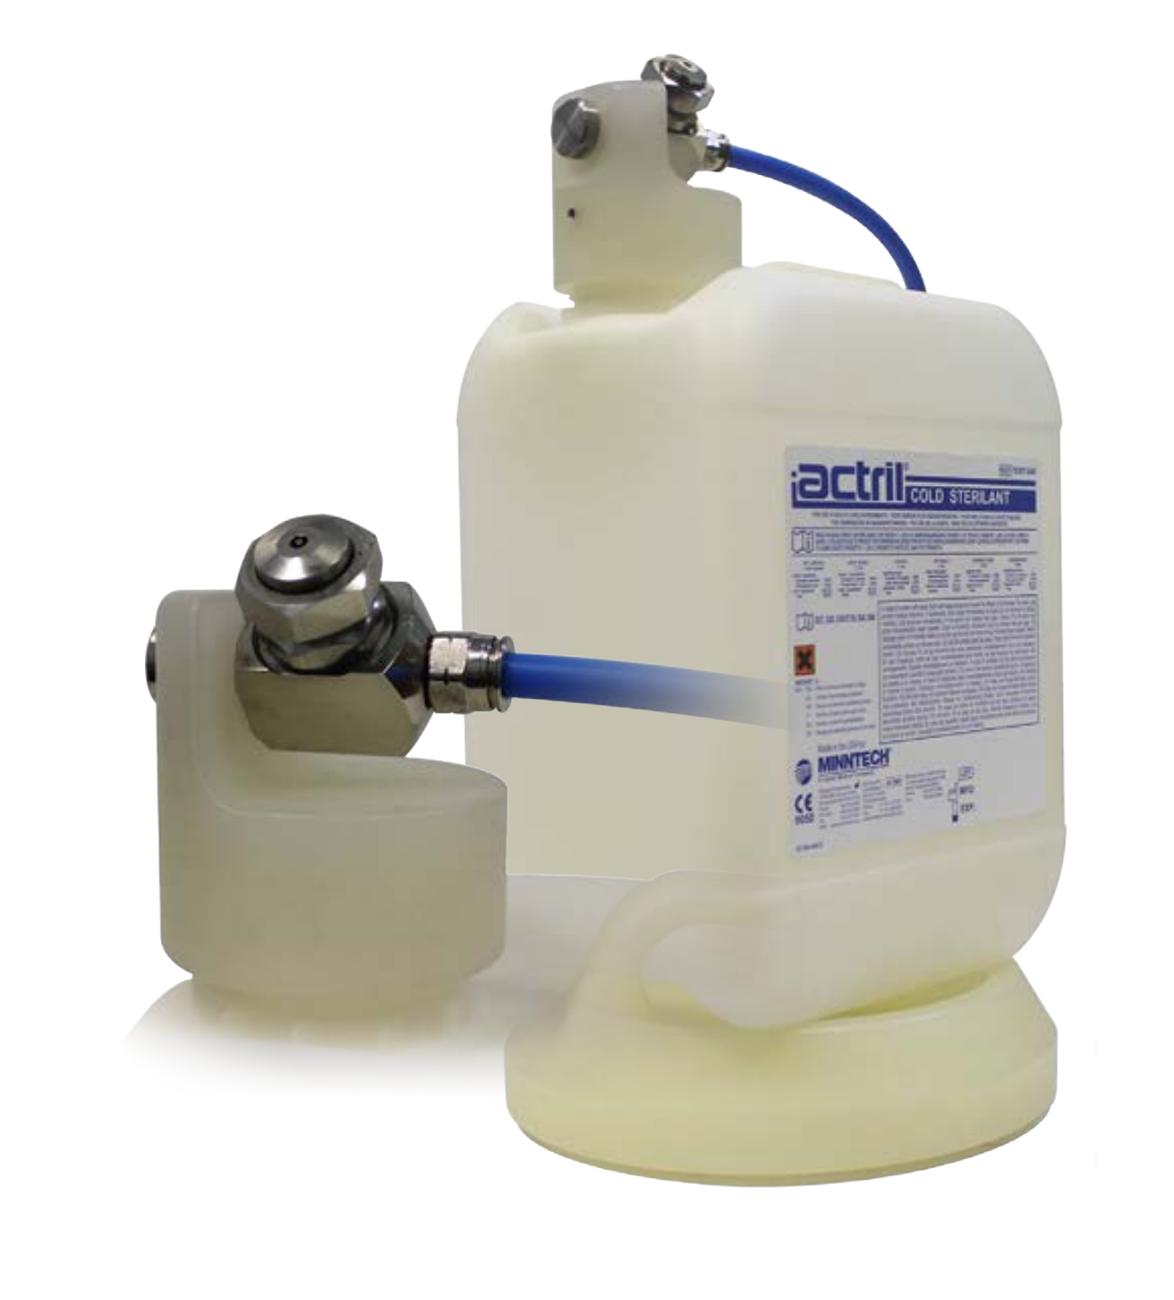 Actril-Fog-System-Cold-Sterilant